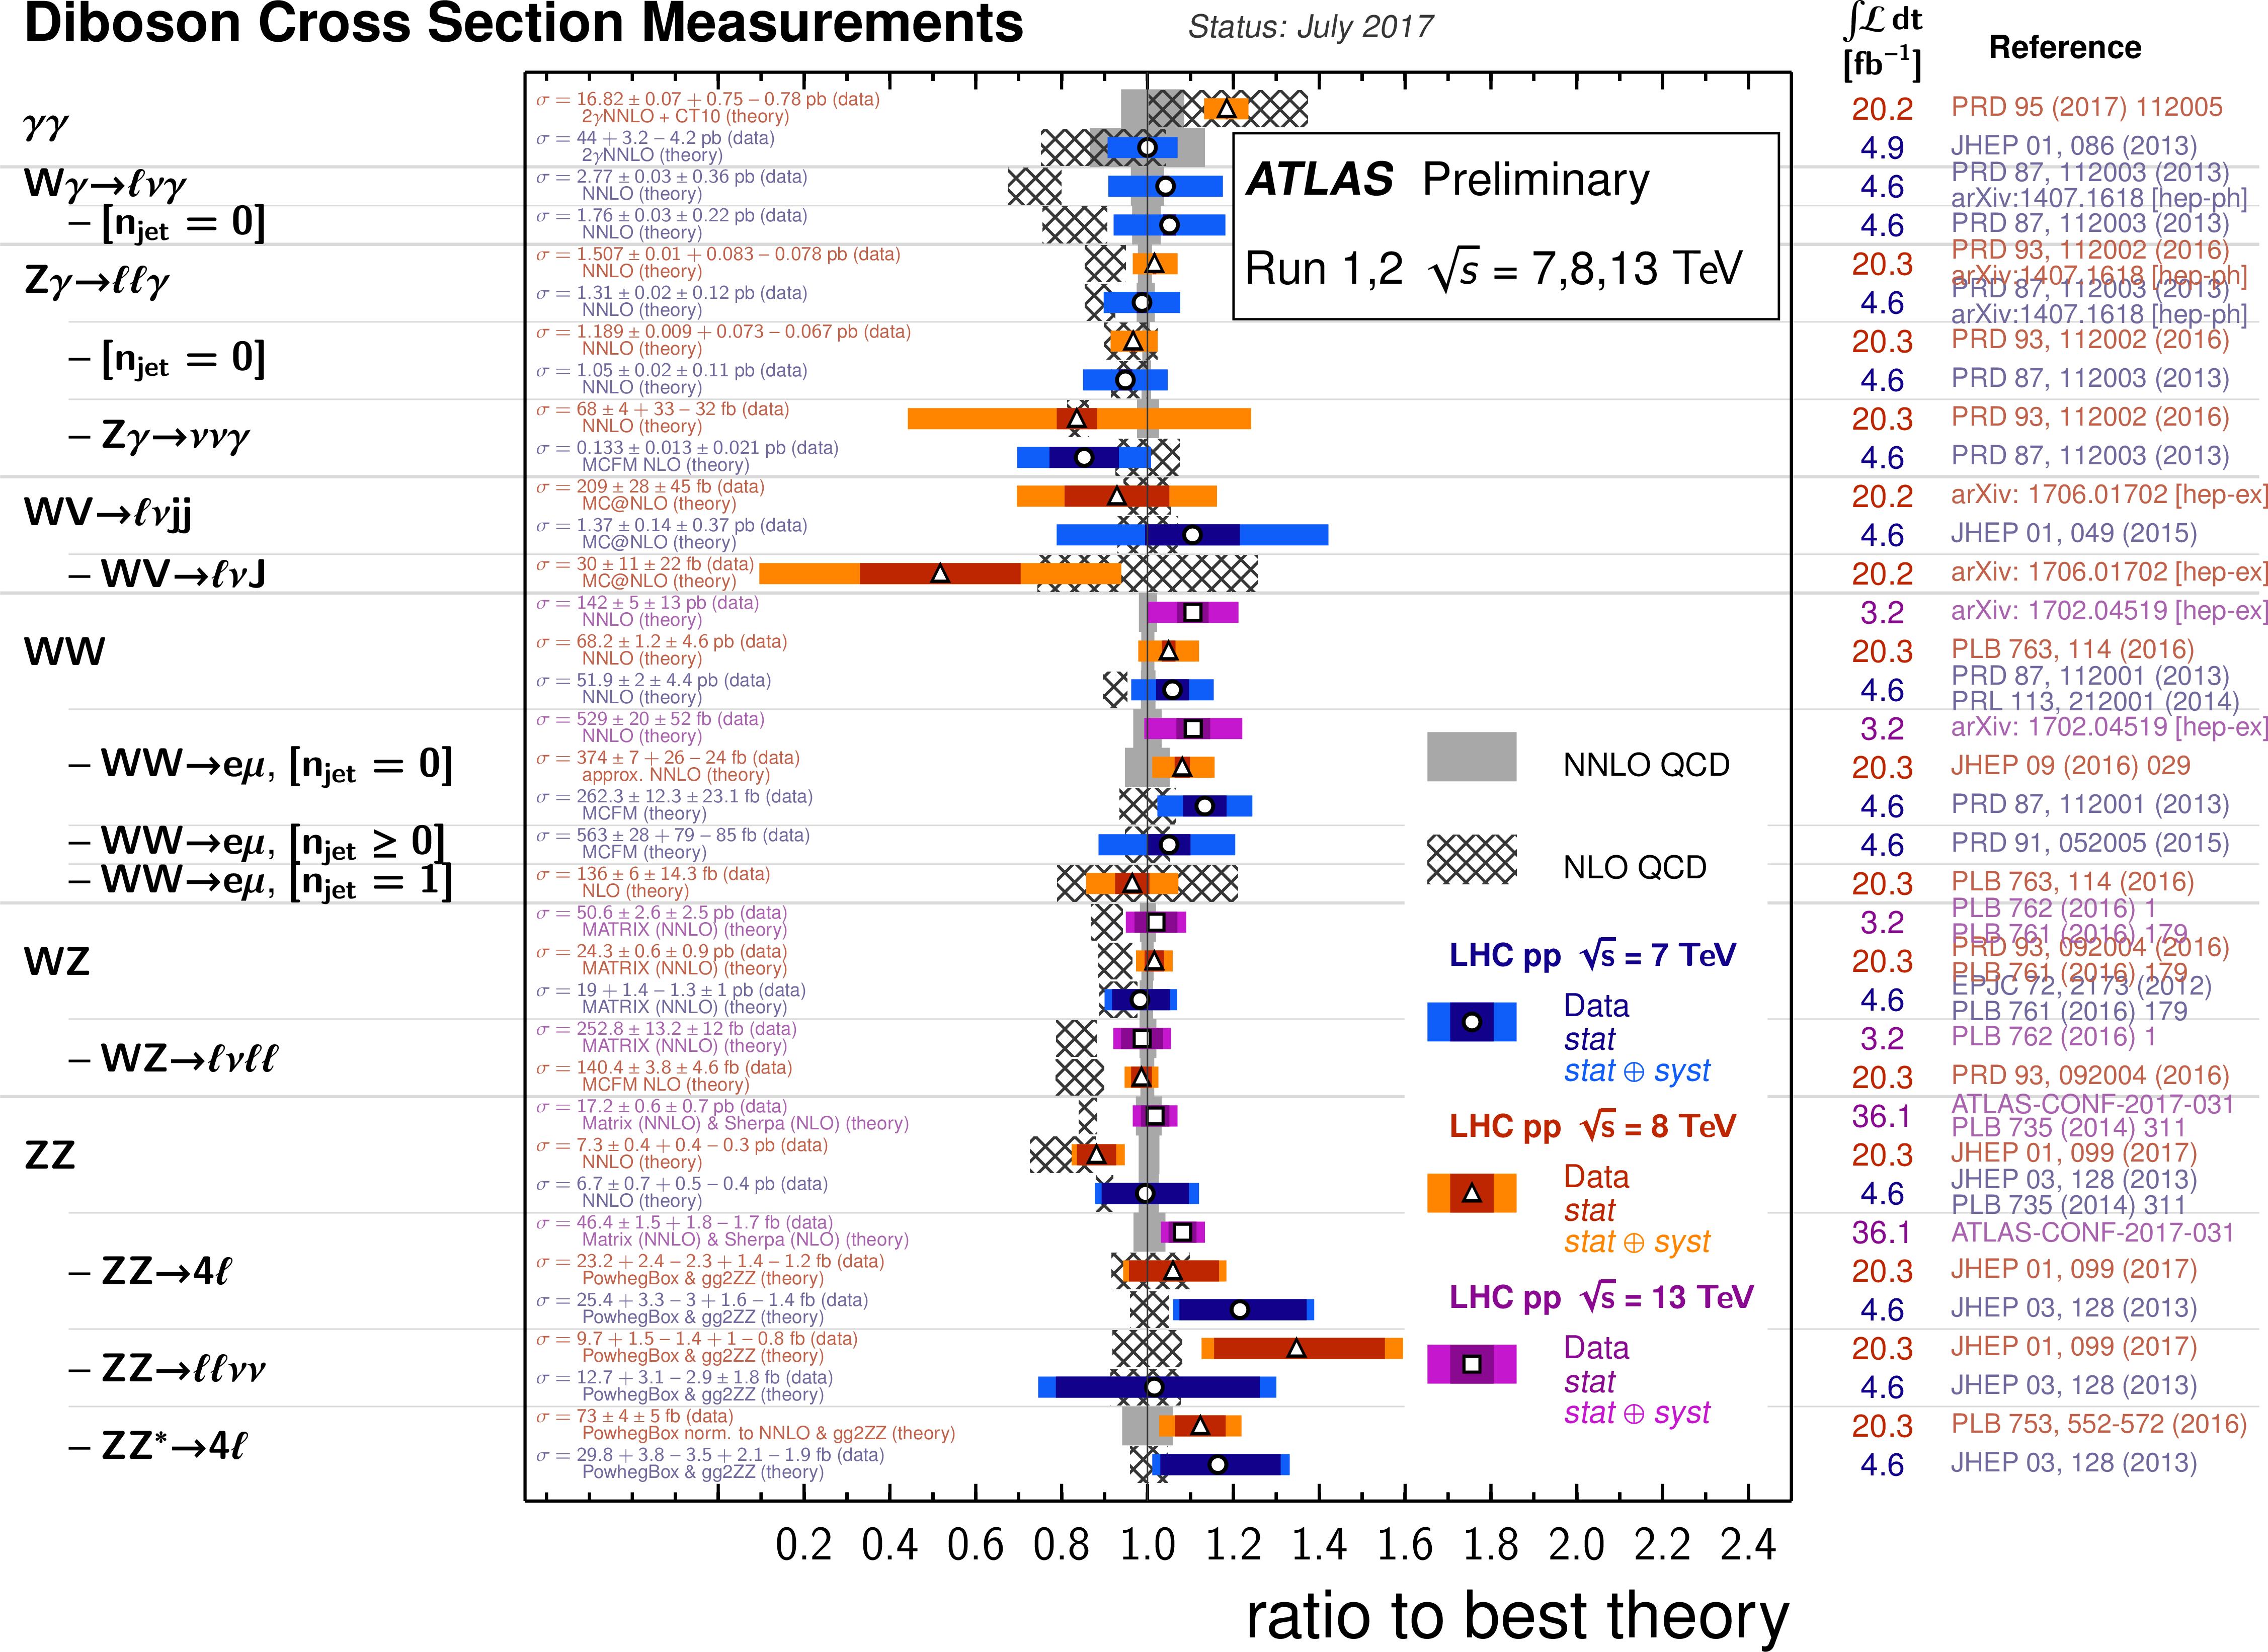 https://atlas.web.cern.ch/Atlas/GROUPS/PHYSICS/CombinedSummaryPlots/SM/ATLAS_h_SMSummary_DiBosonFiducialRatio/ATLAS_h_SMSummary_DiBosonFiducialRatio.png